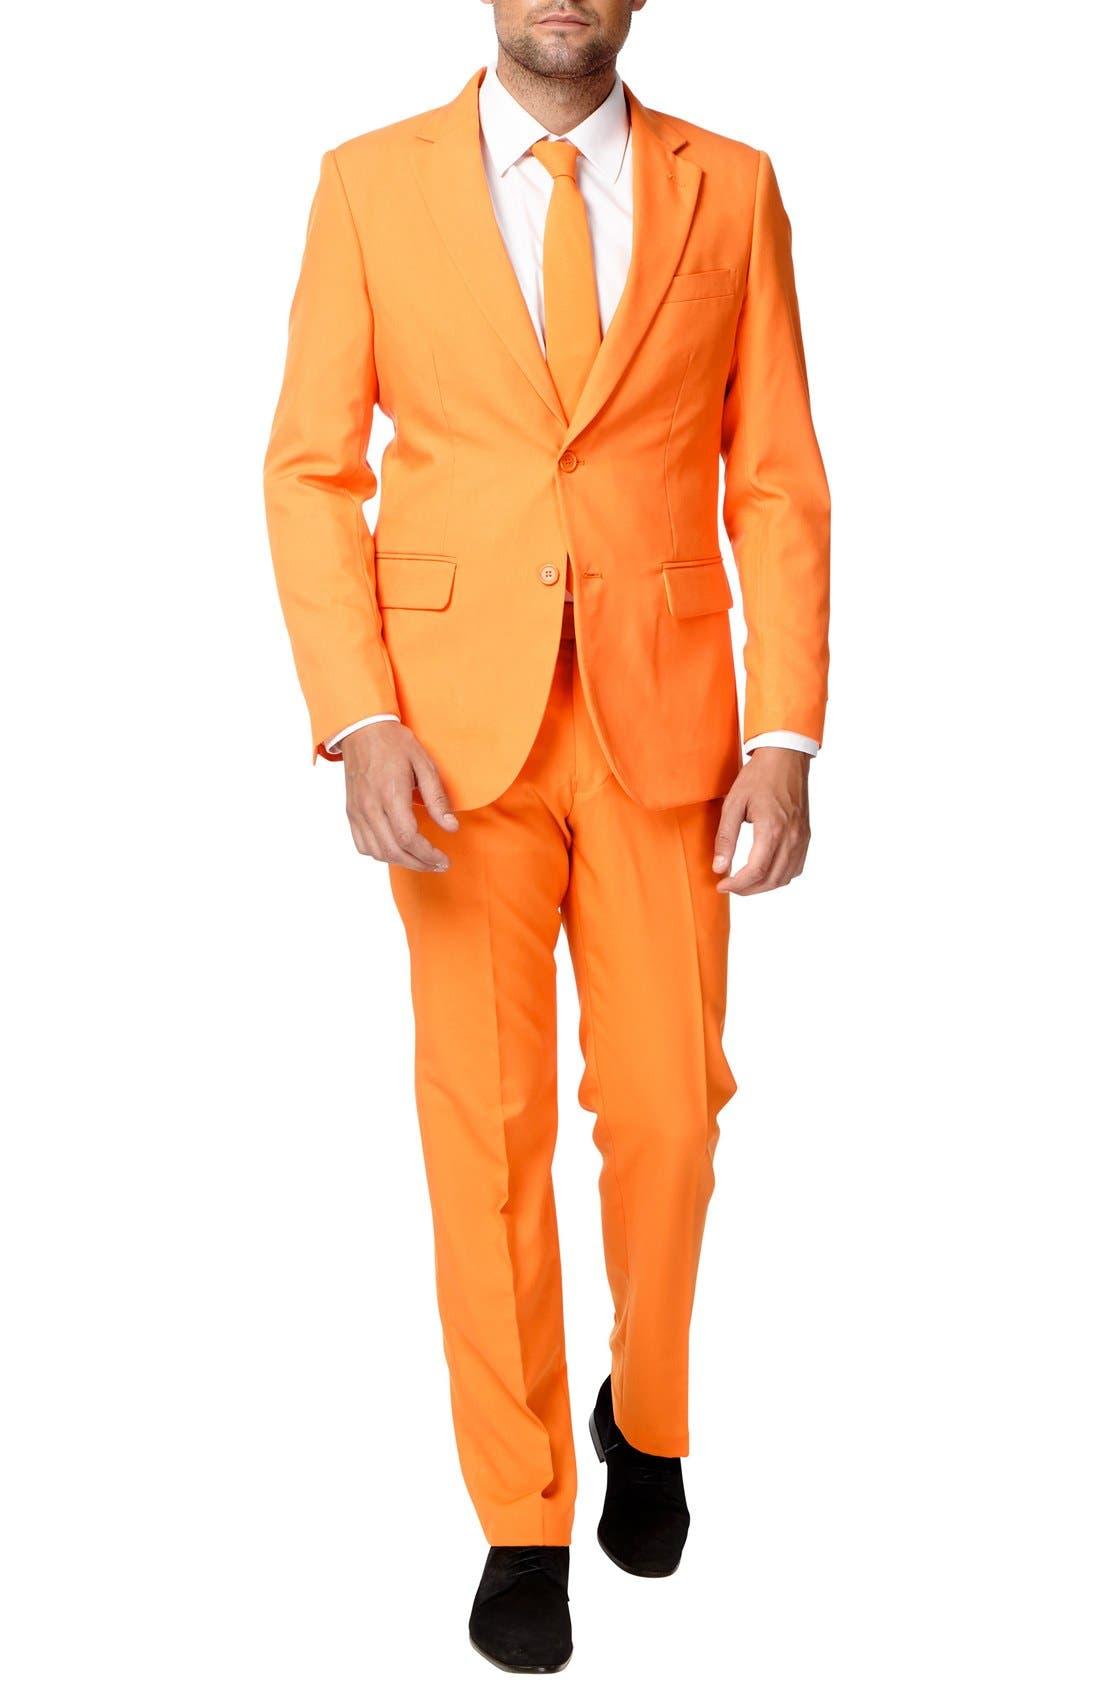 'The Orange' Trim Fit Two-Piece Suit with Tie,                             Alternate thumbnail 4, color,